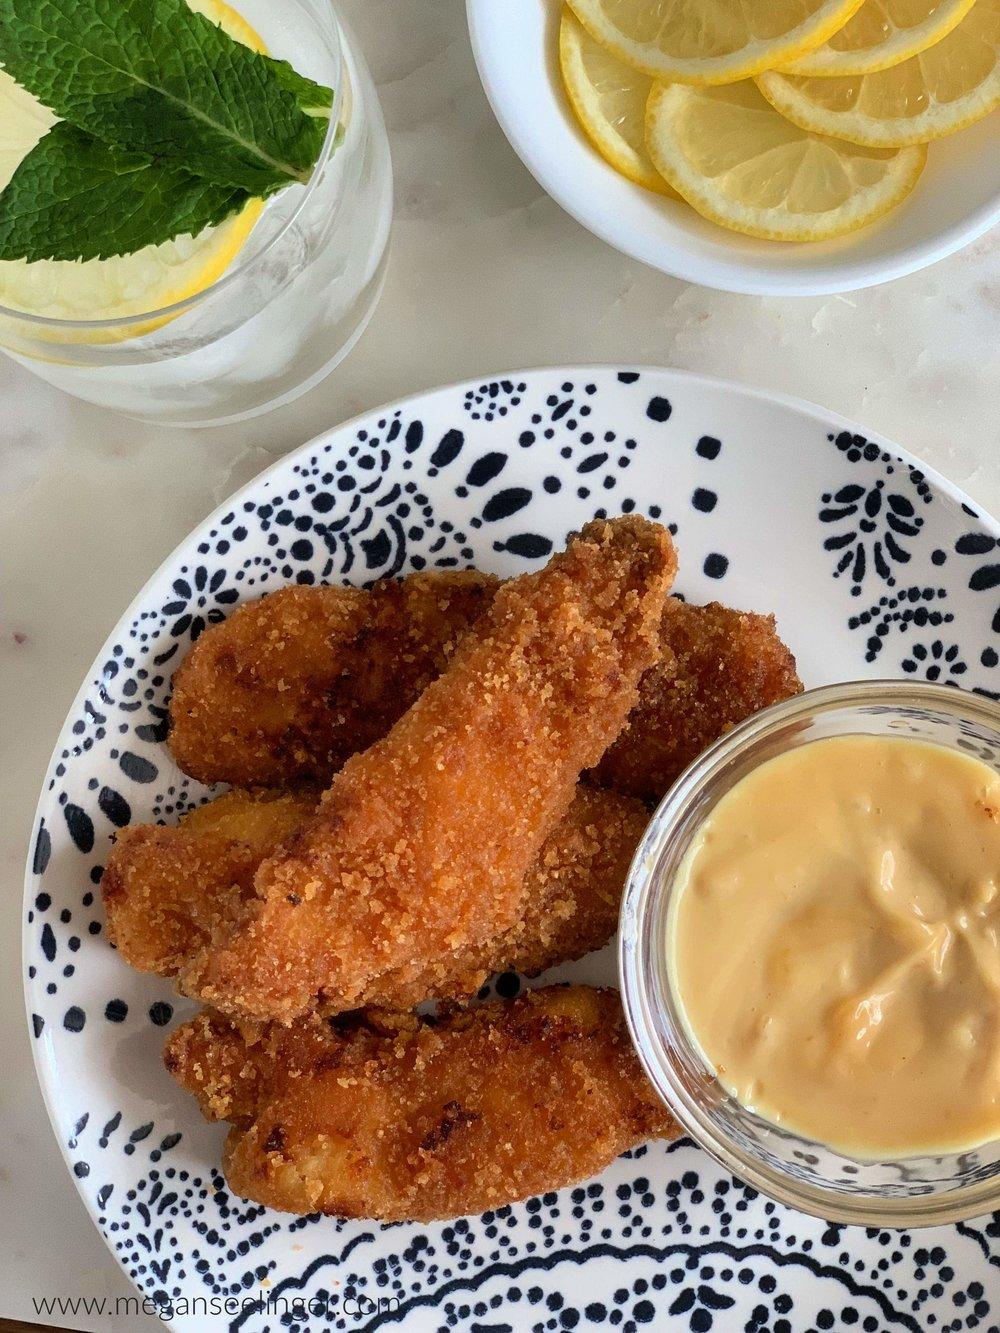 Keto Fried Chicken Tenders